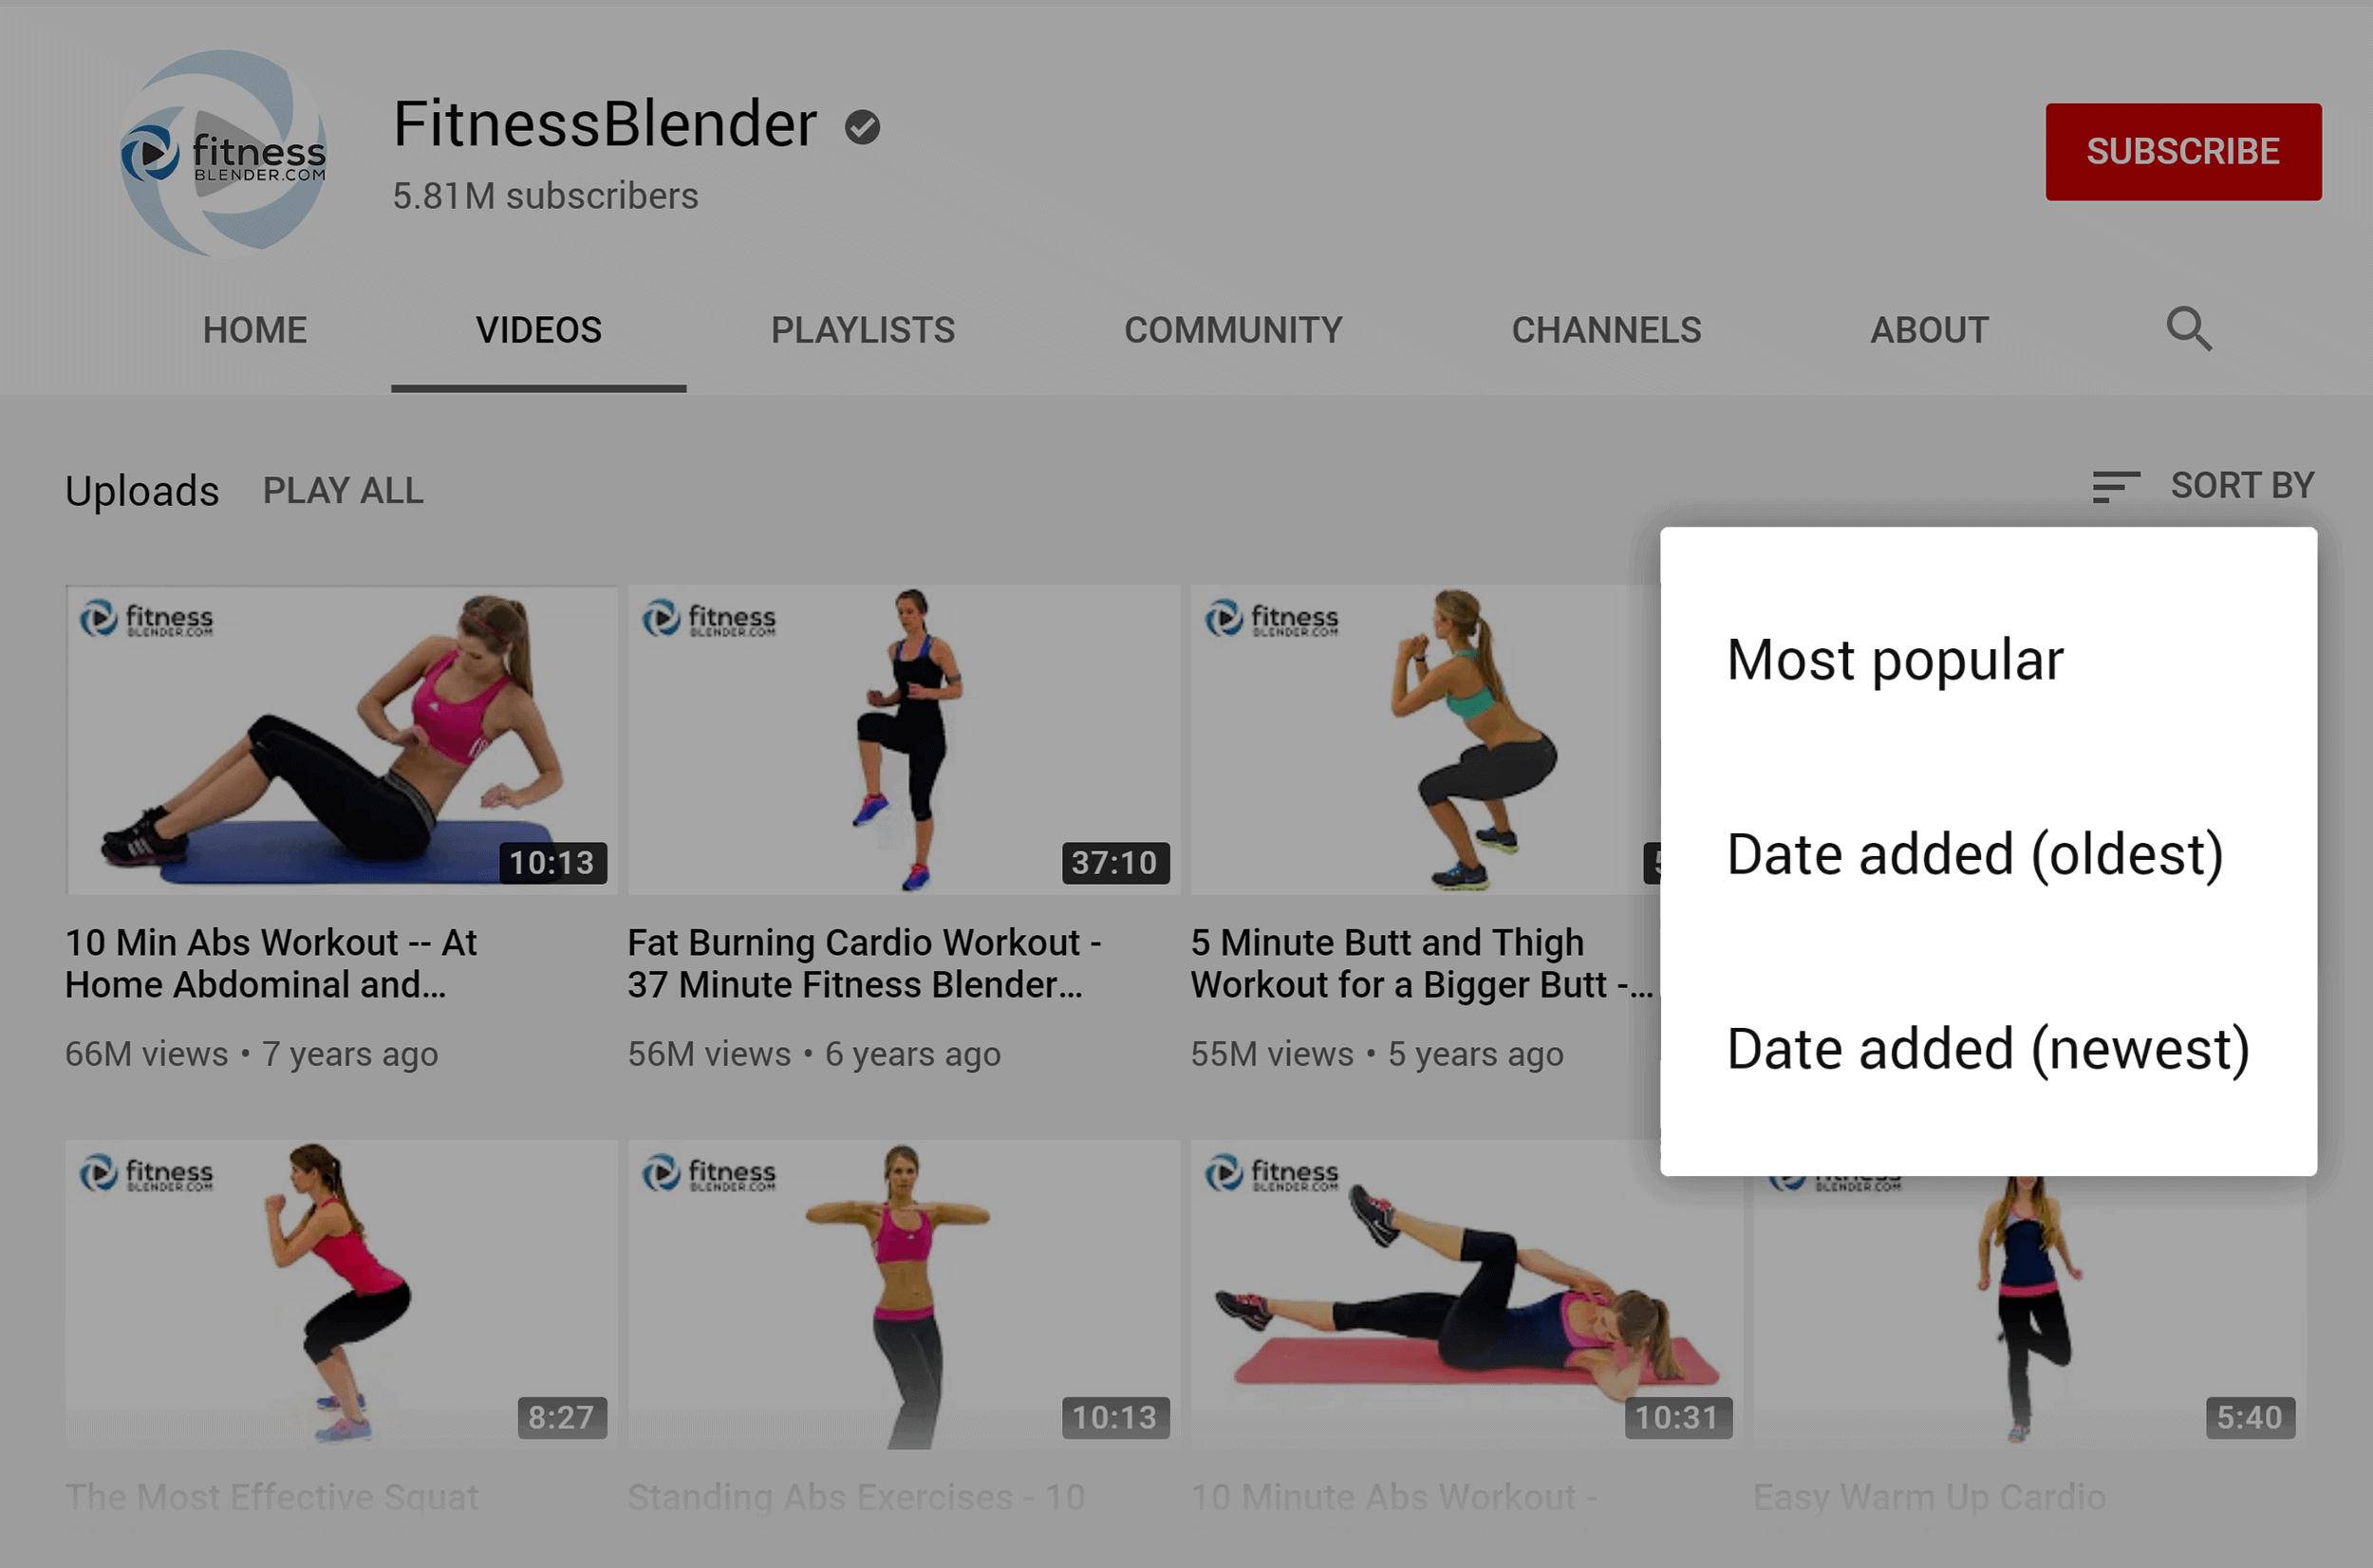 YouTube – FitnessBlender – Sort by most popular